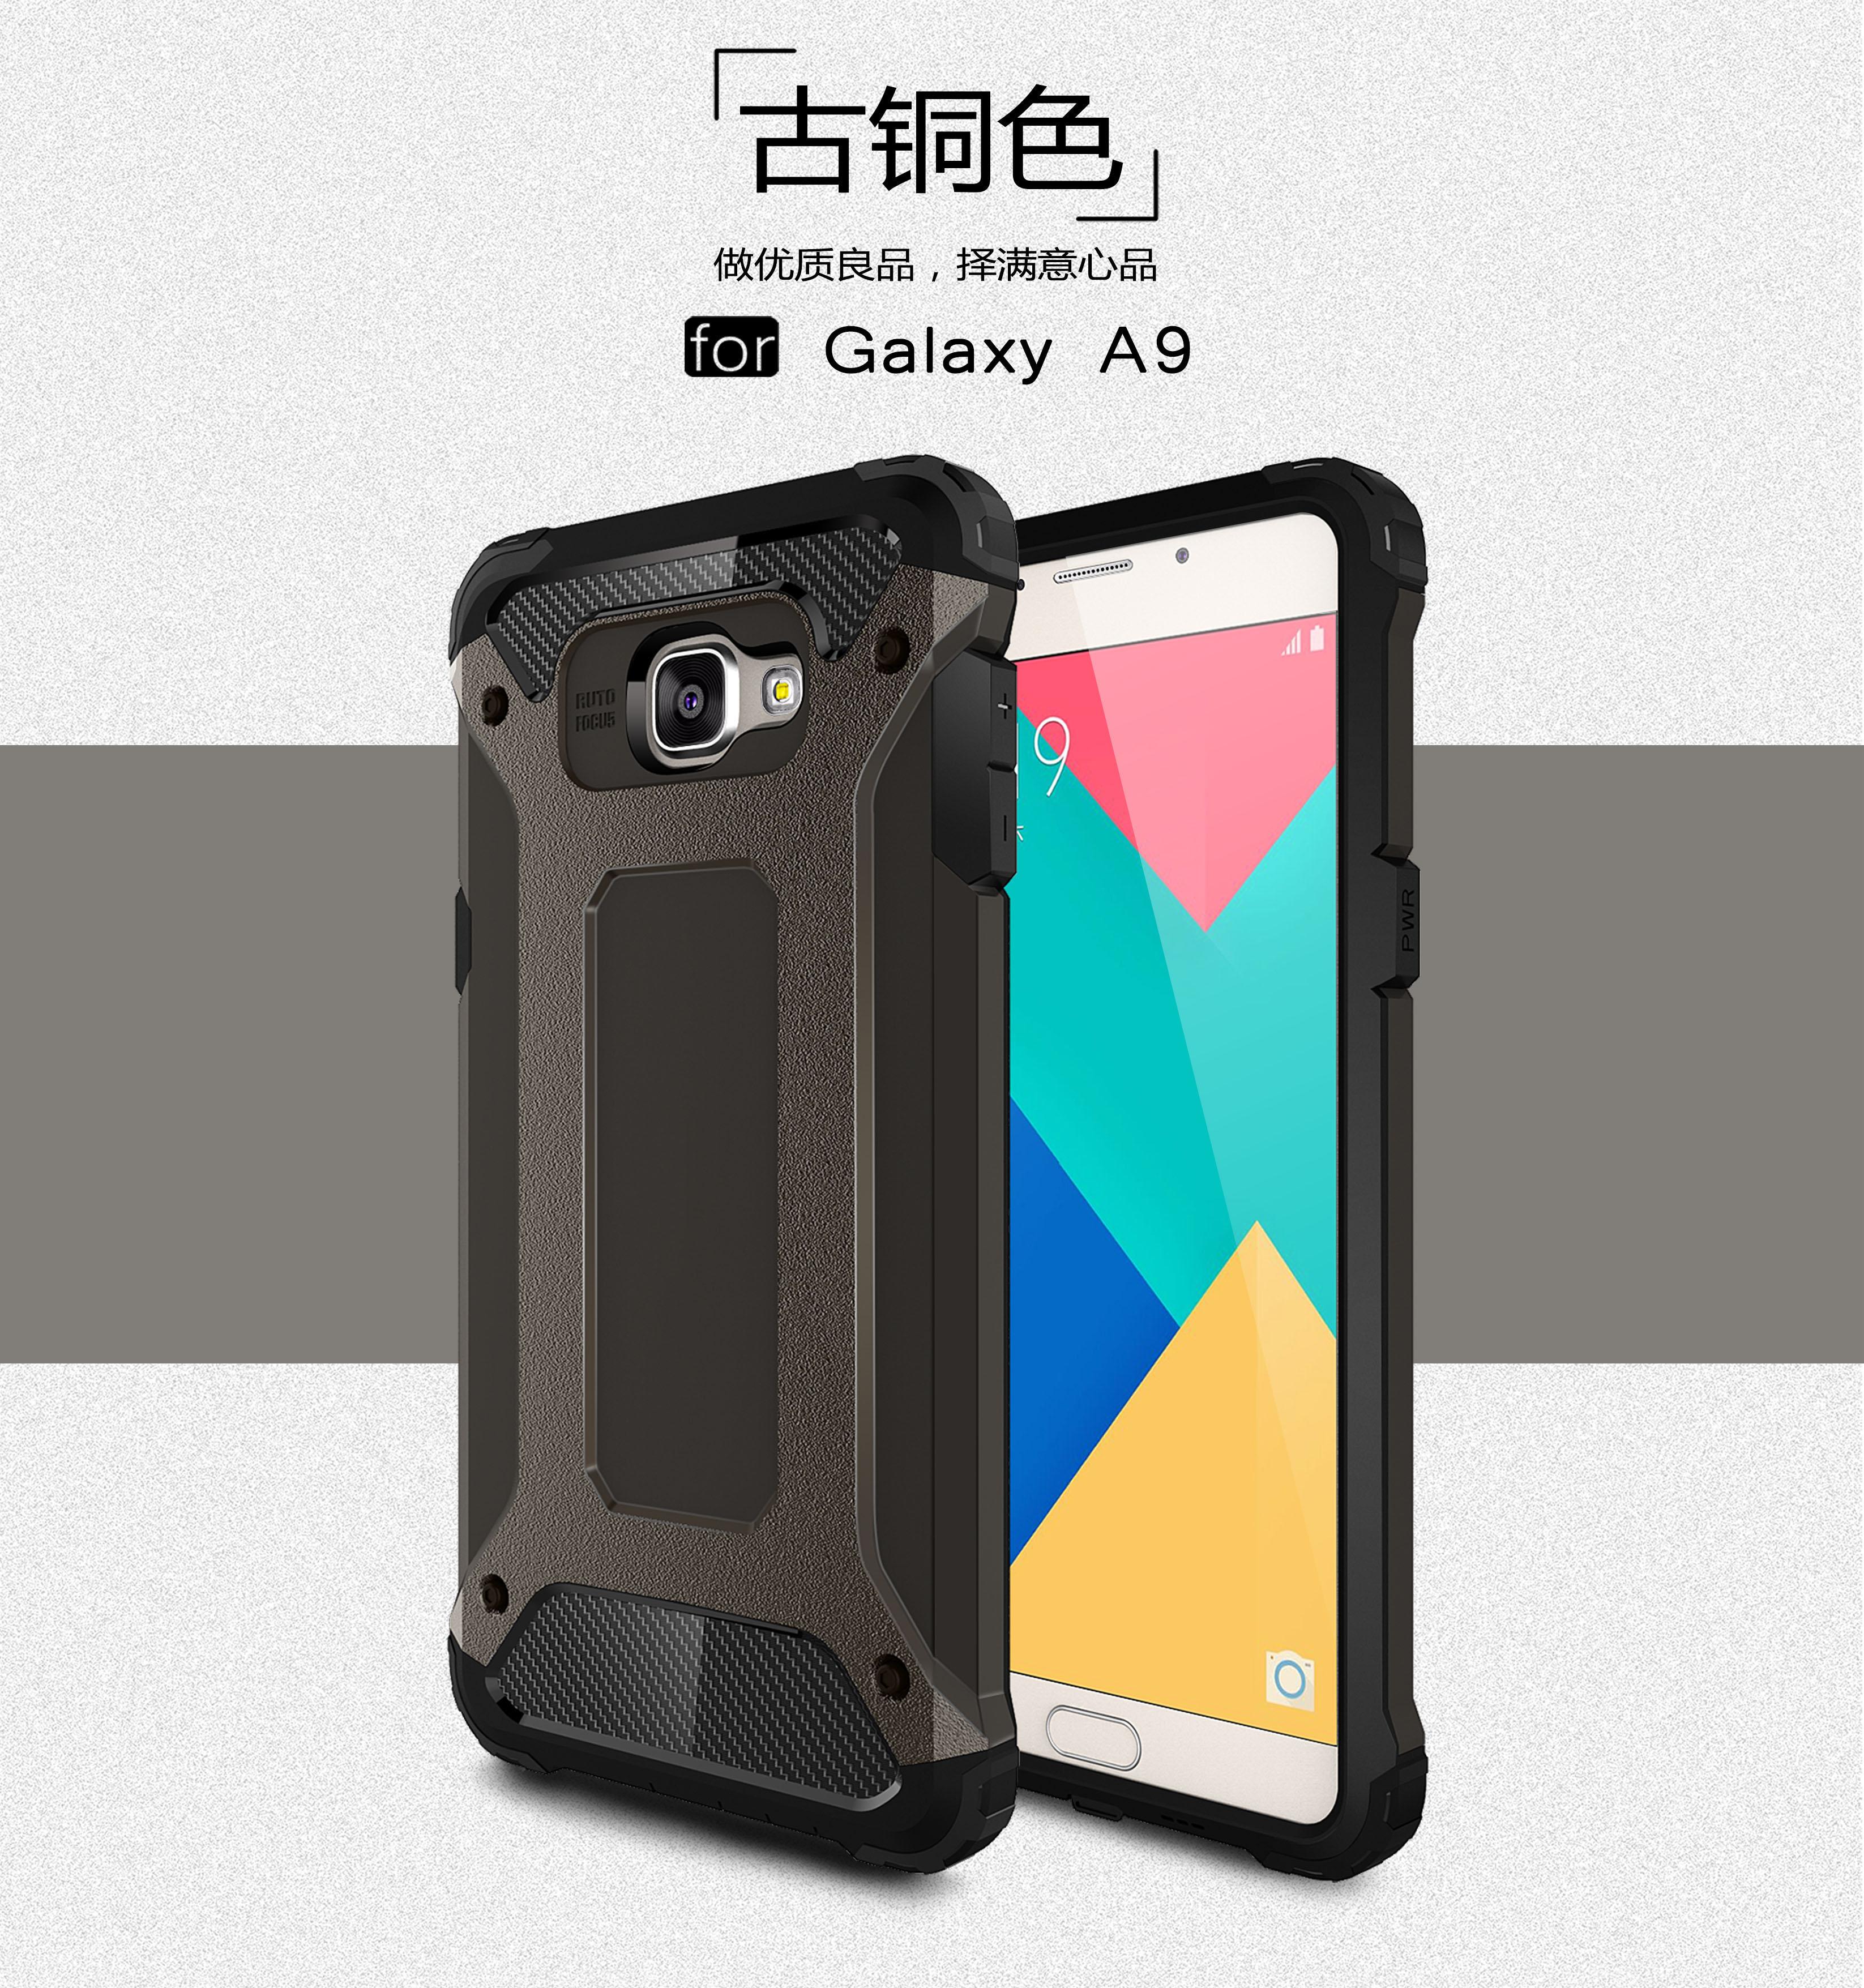 For Coque Samsung Galaxy A9 pro Case SM A910F Samsung ... Galaxy Star Pro Cover